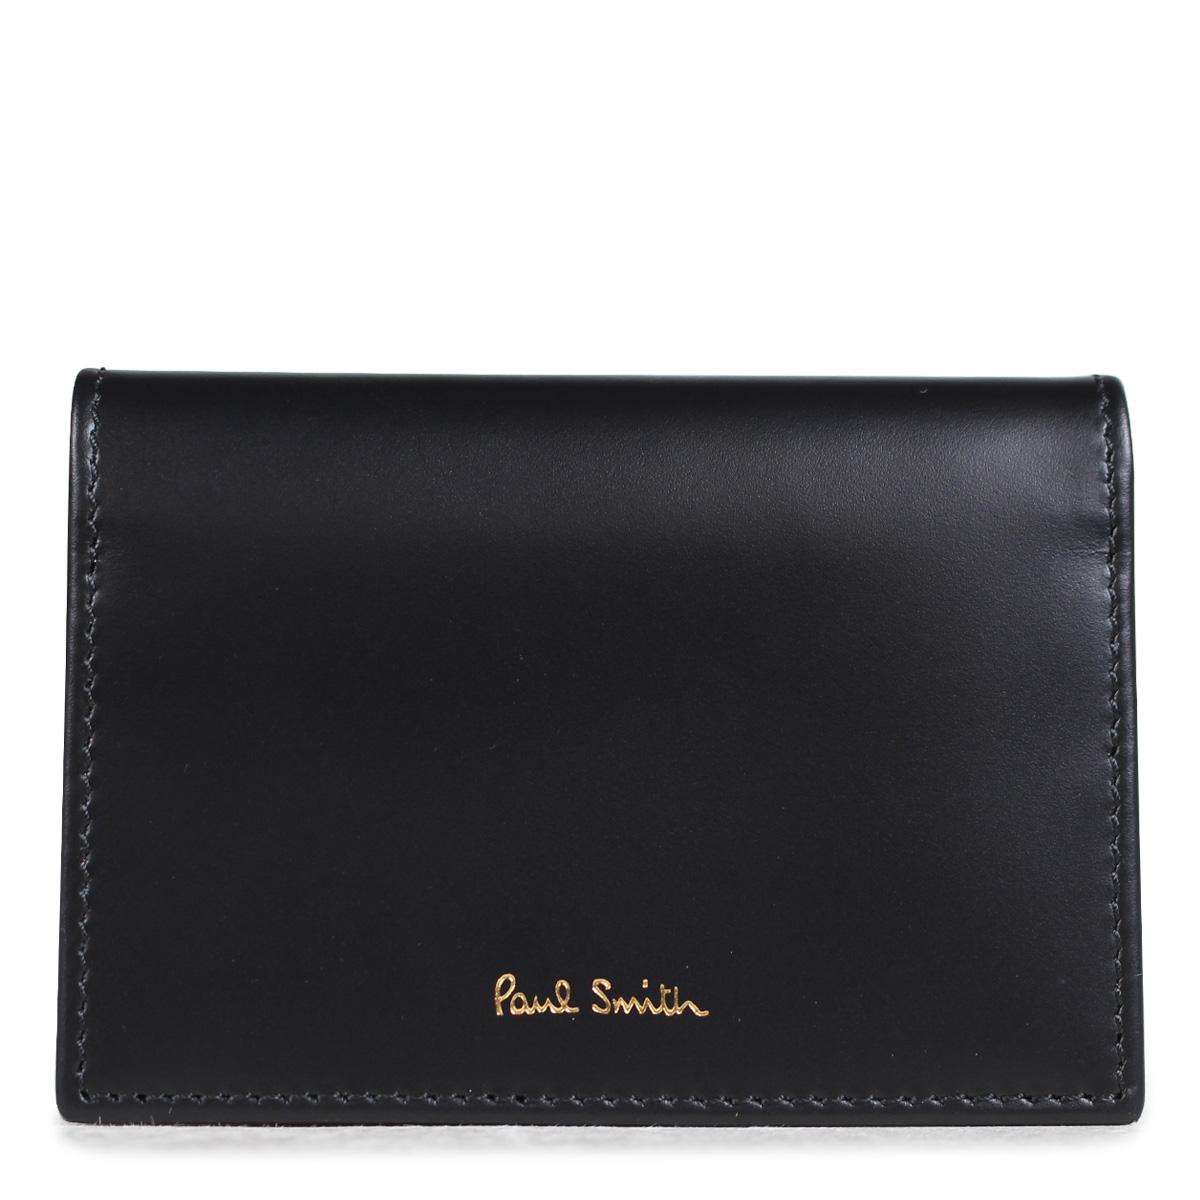 Paul Smith FOLD OVER CREDIT CARD CASE ポールスミス 名刺入れ メンズ カードケース 4776 W761A 79 ブラック